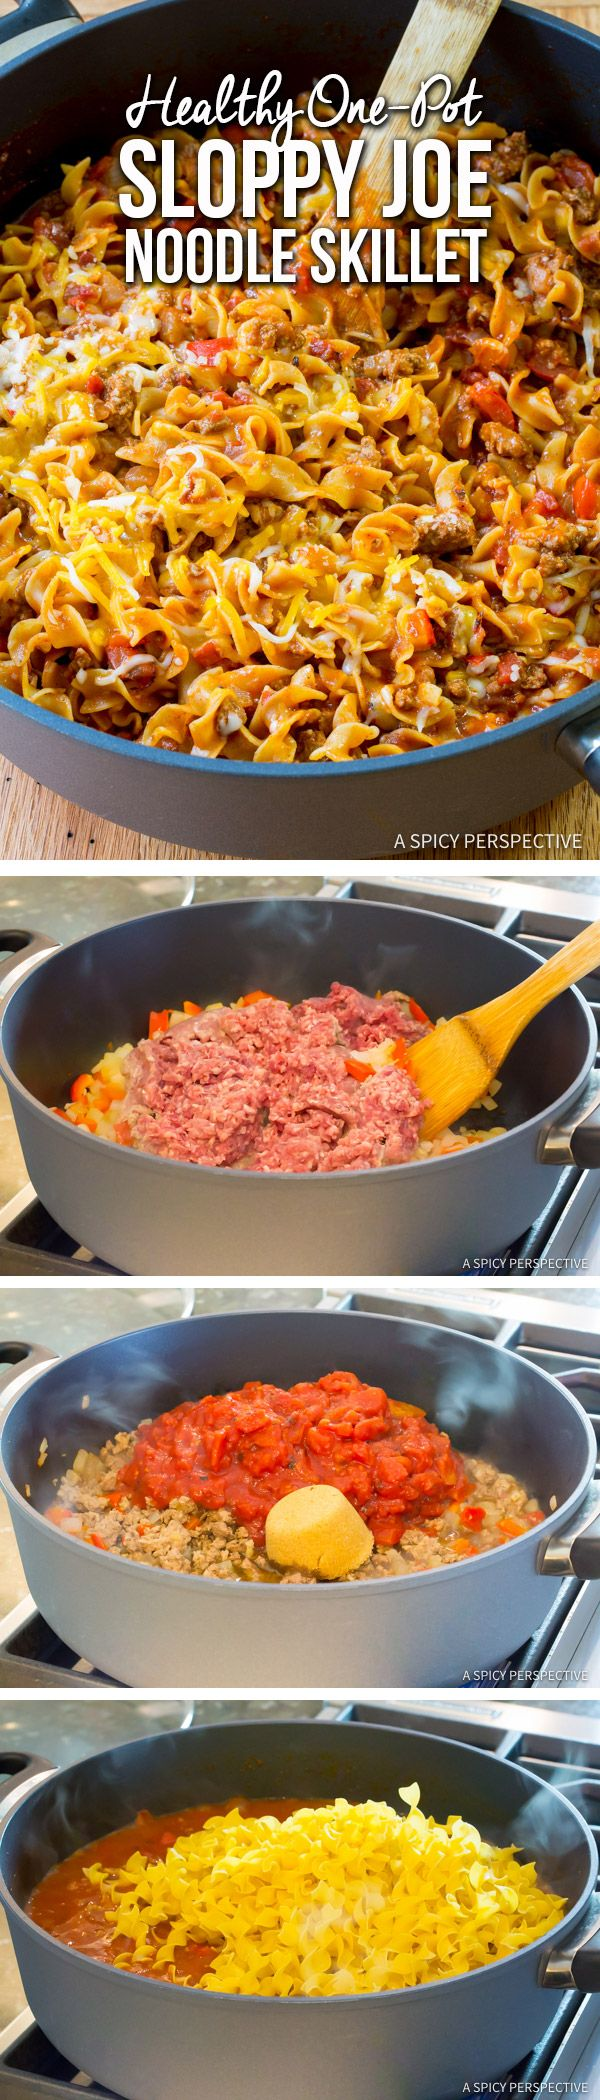 Healthified One-Pot Sloppy Joe Noodle Skillet | ASpicyPerspective.com